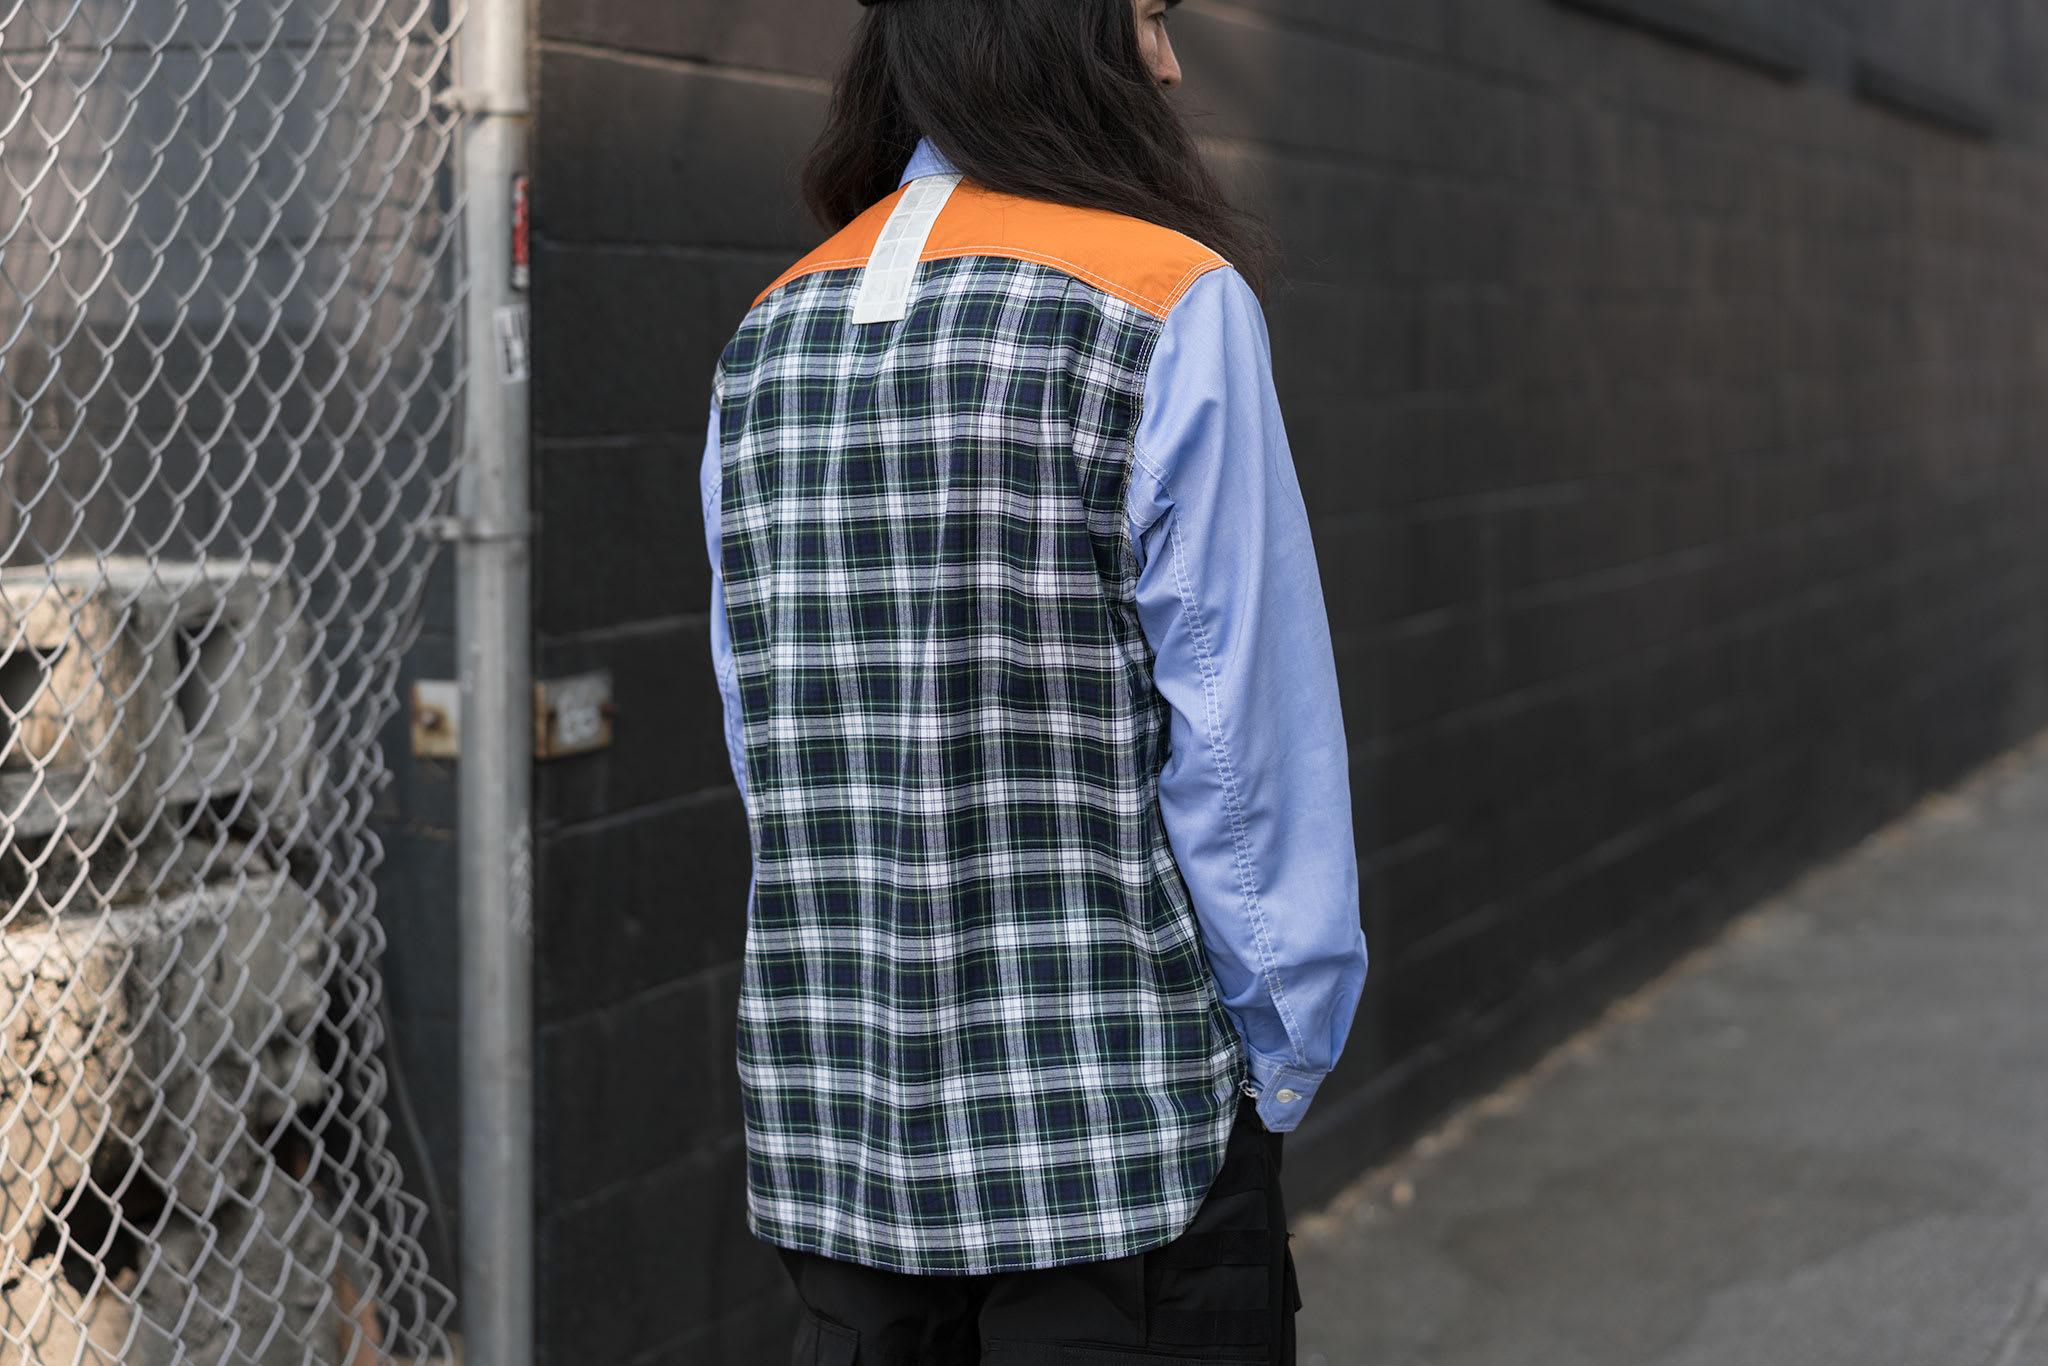 HAVEN Lookbook, Junya Watanabe MAN Cotton Oxford Check Shirt Sax/Gray